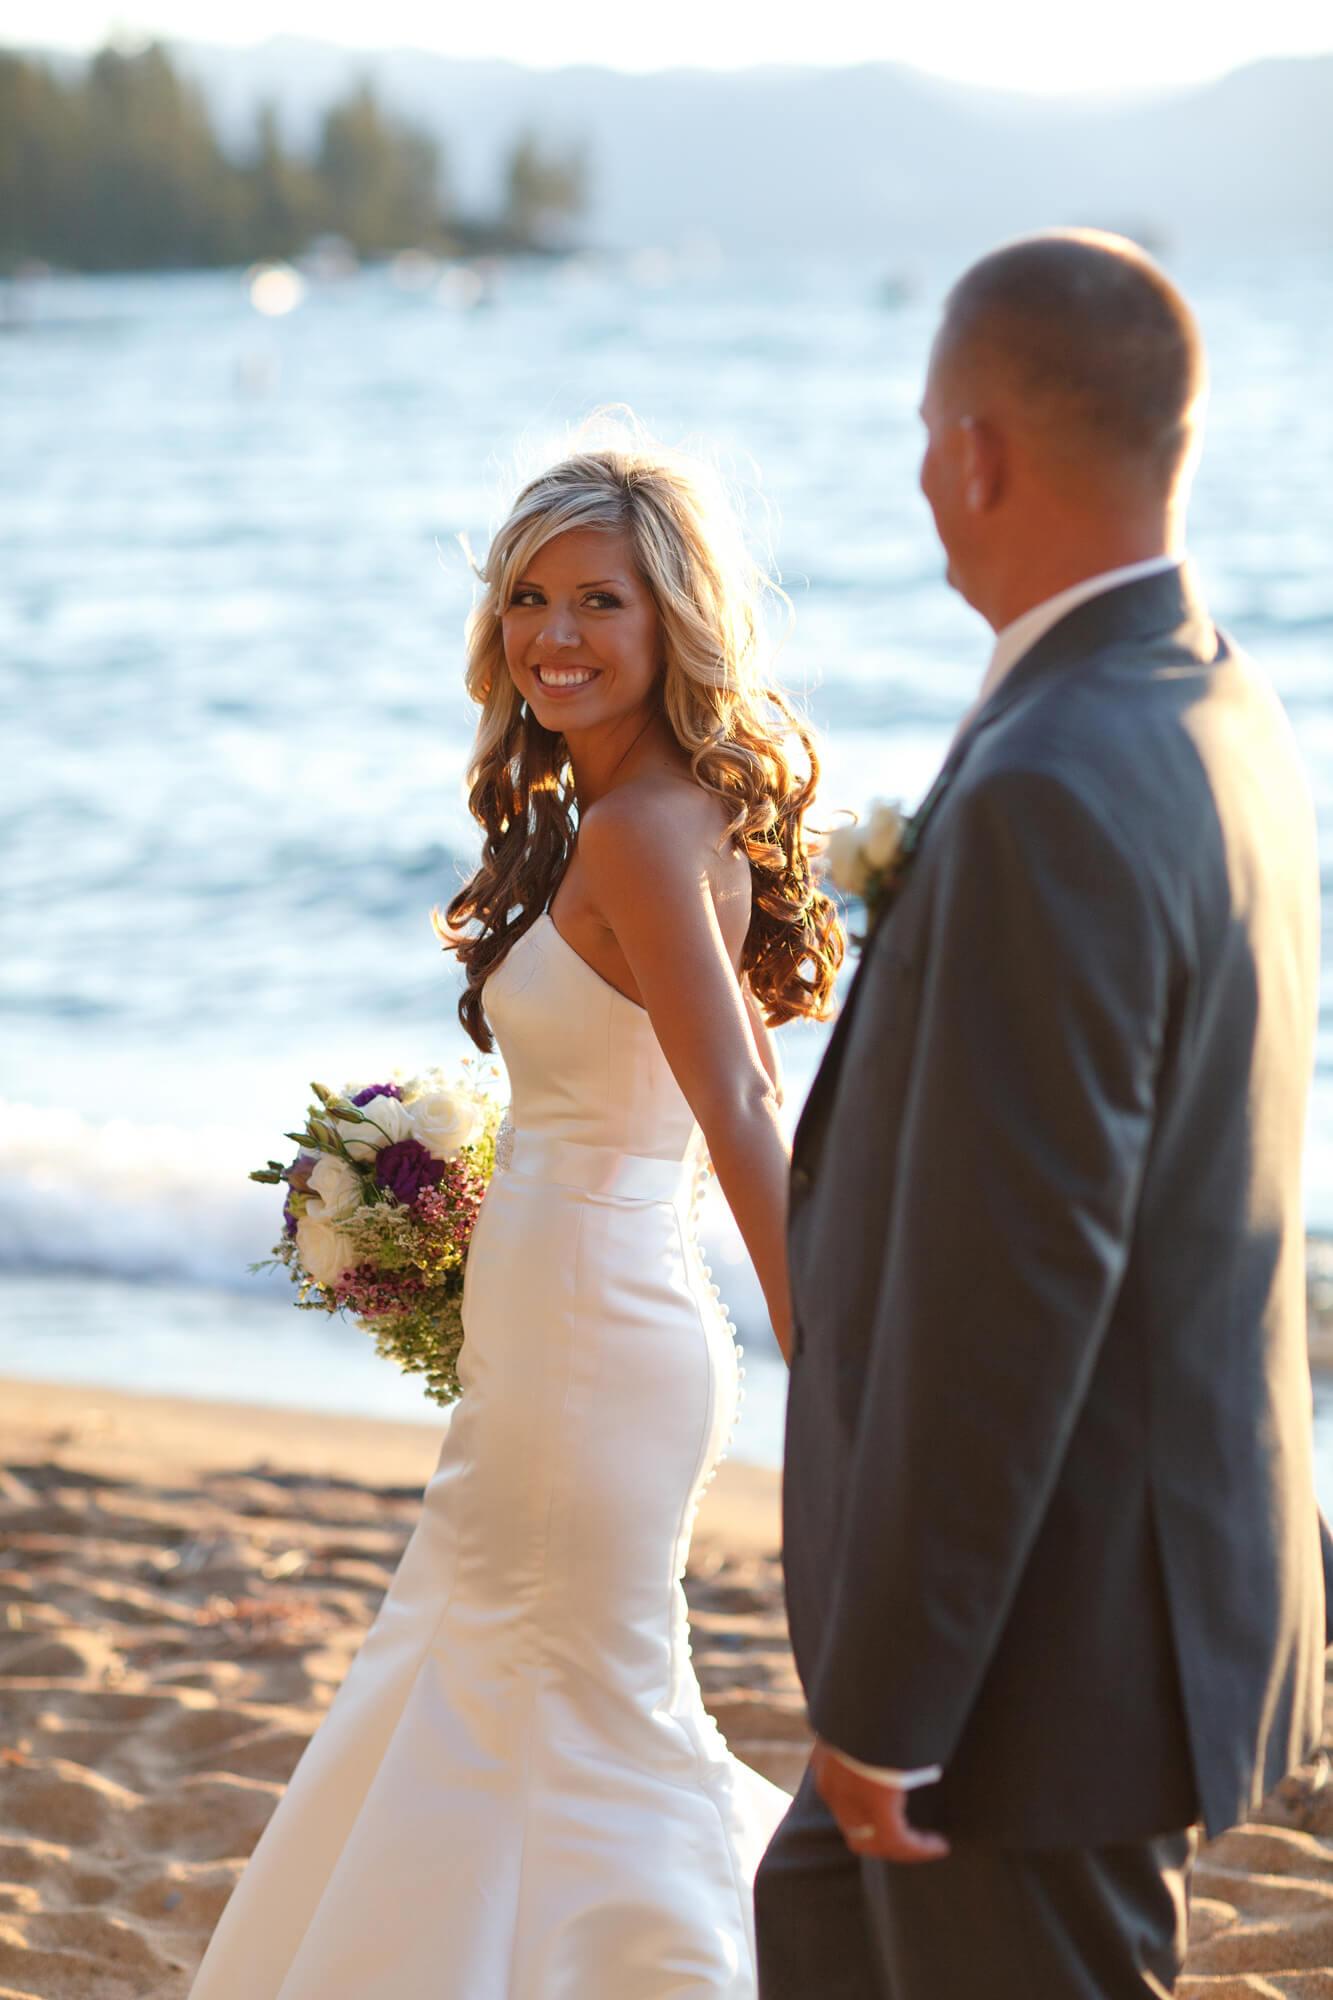 The Decorated Bride - Erika